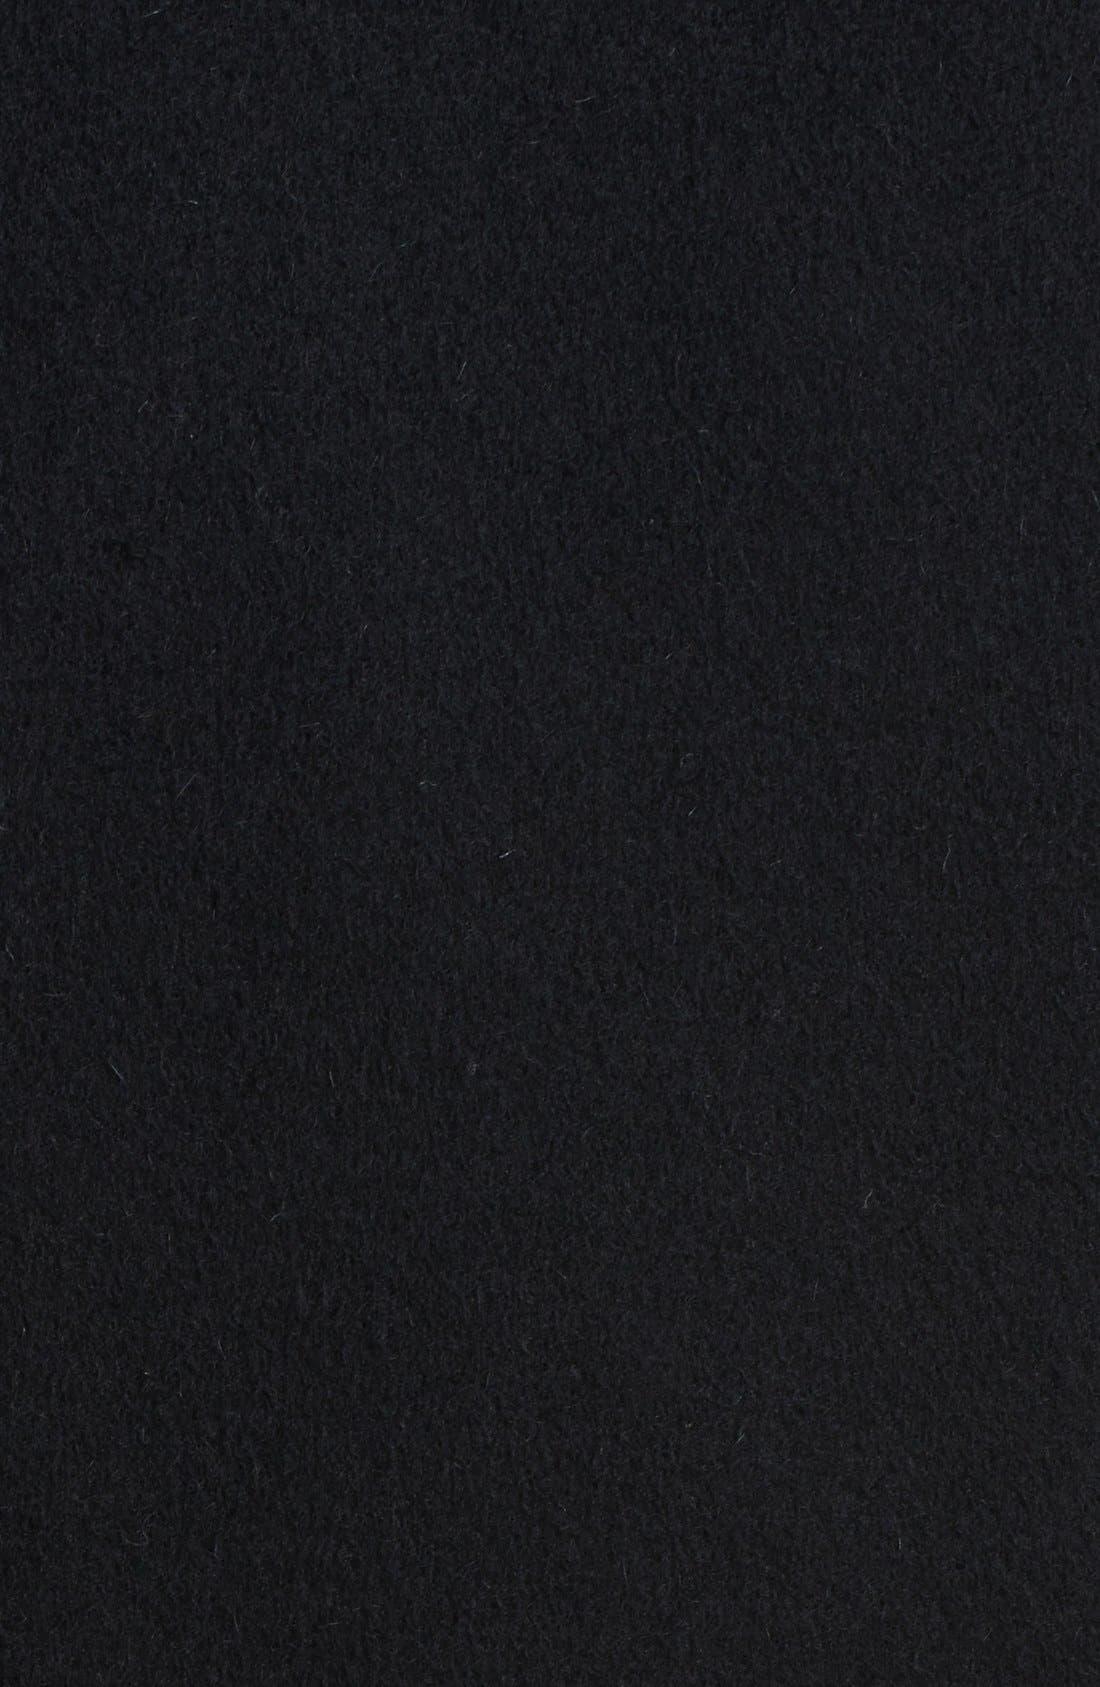 'Basingstoke' Wool & Cashmere Coat,                             Alternate thumbnail 2, color,                             001